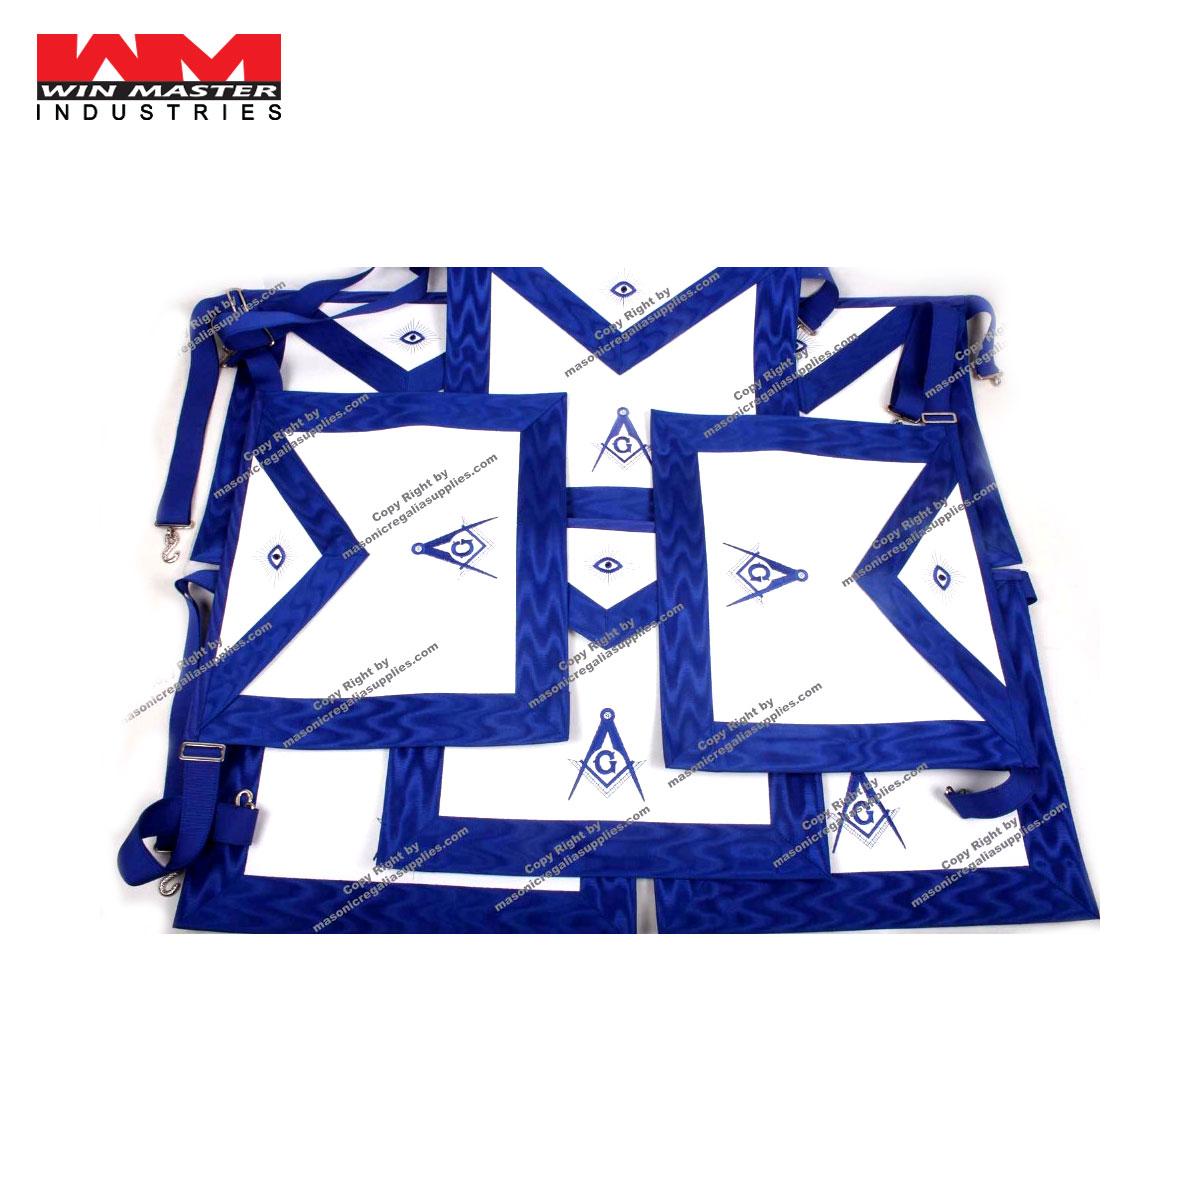 Masonic Masonry Blue Lodge Master Mason Aprons Royal Blue Grosgrain Borders  - Buy Masonic Masonry Blue Lodge Master Mason Aprons Royal Blue Grosgrain